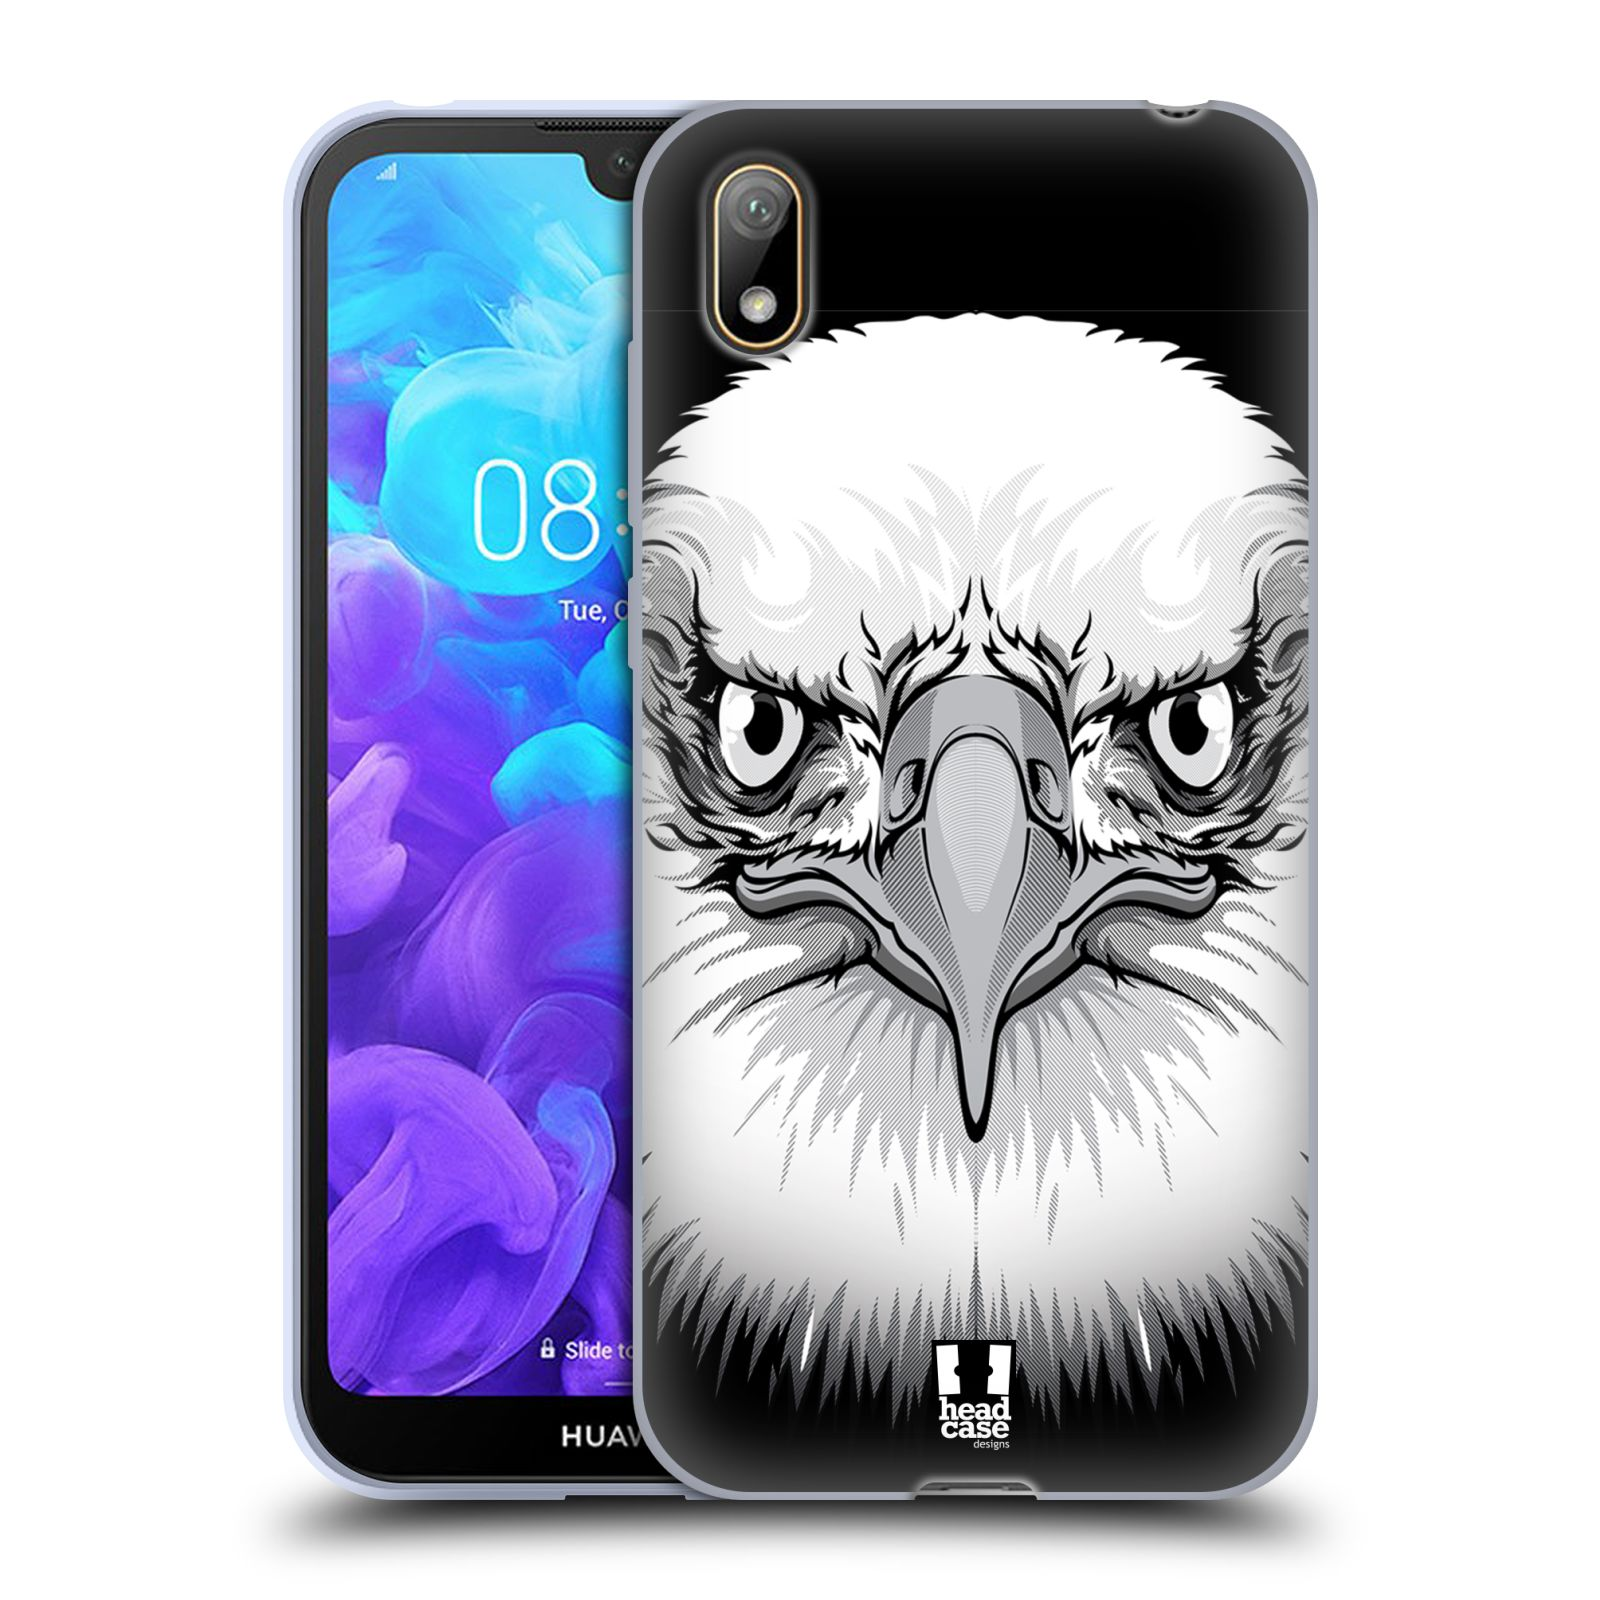 Silikonové pouzdro na mobil Huawei Y5 (2019) - Head Case - ILUSTROVANÝ OREL